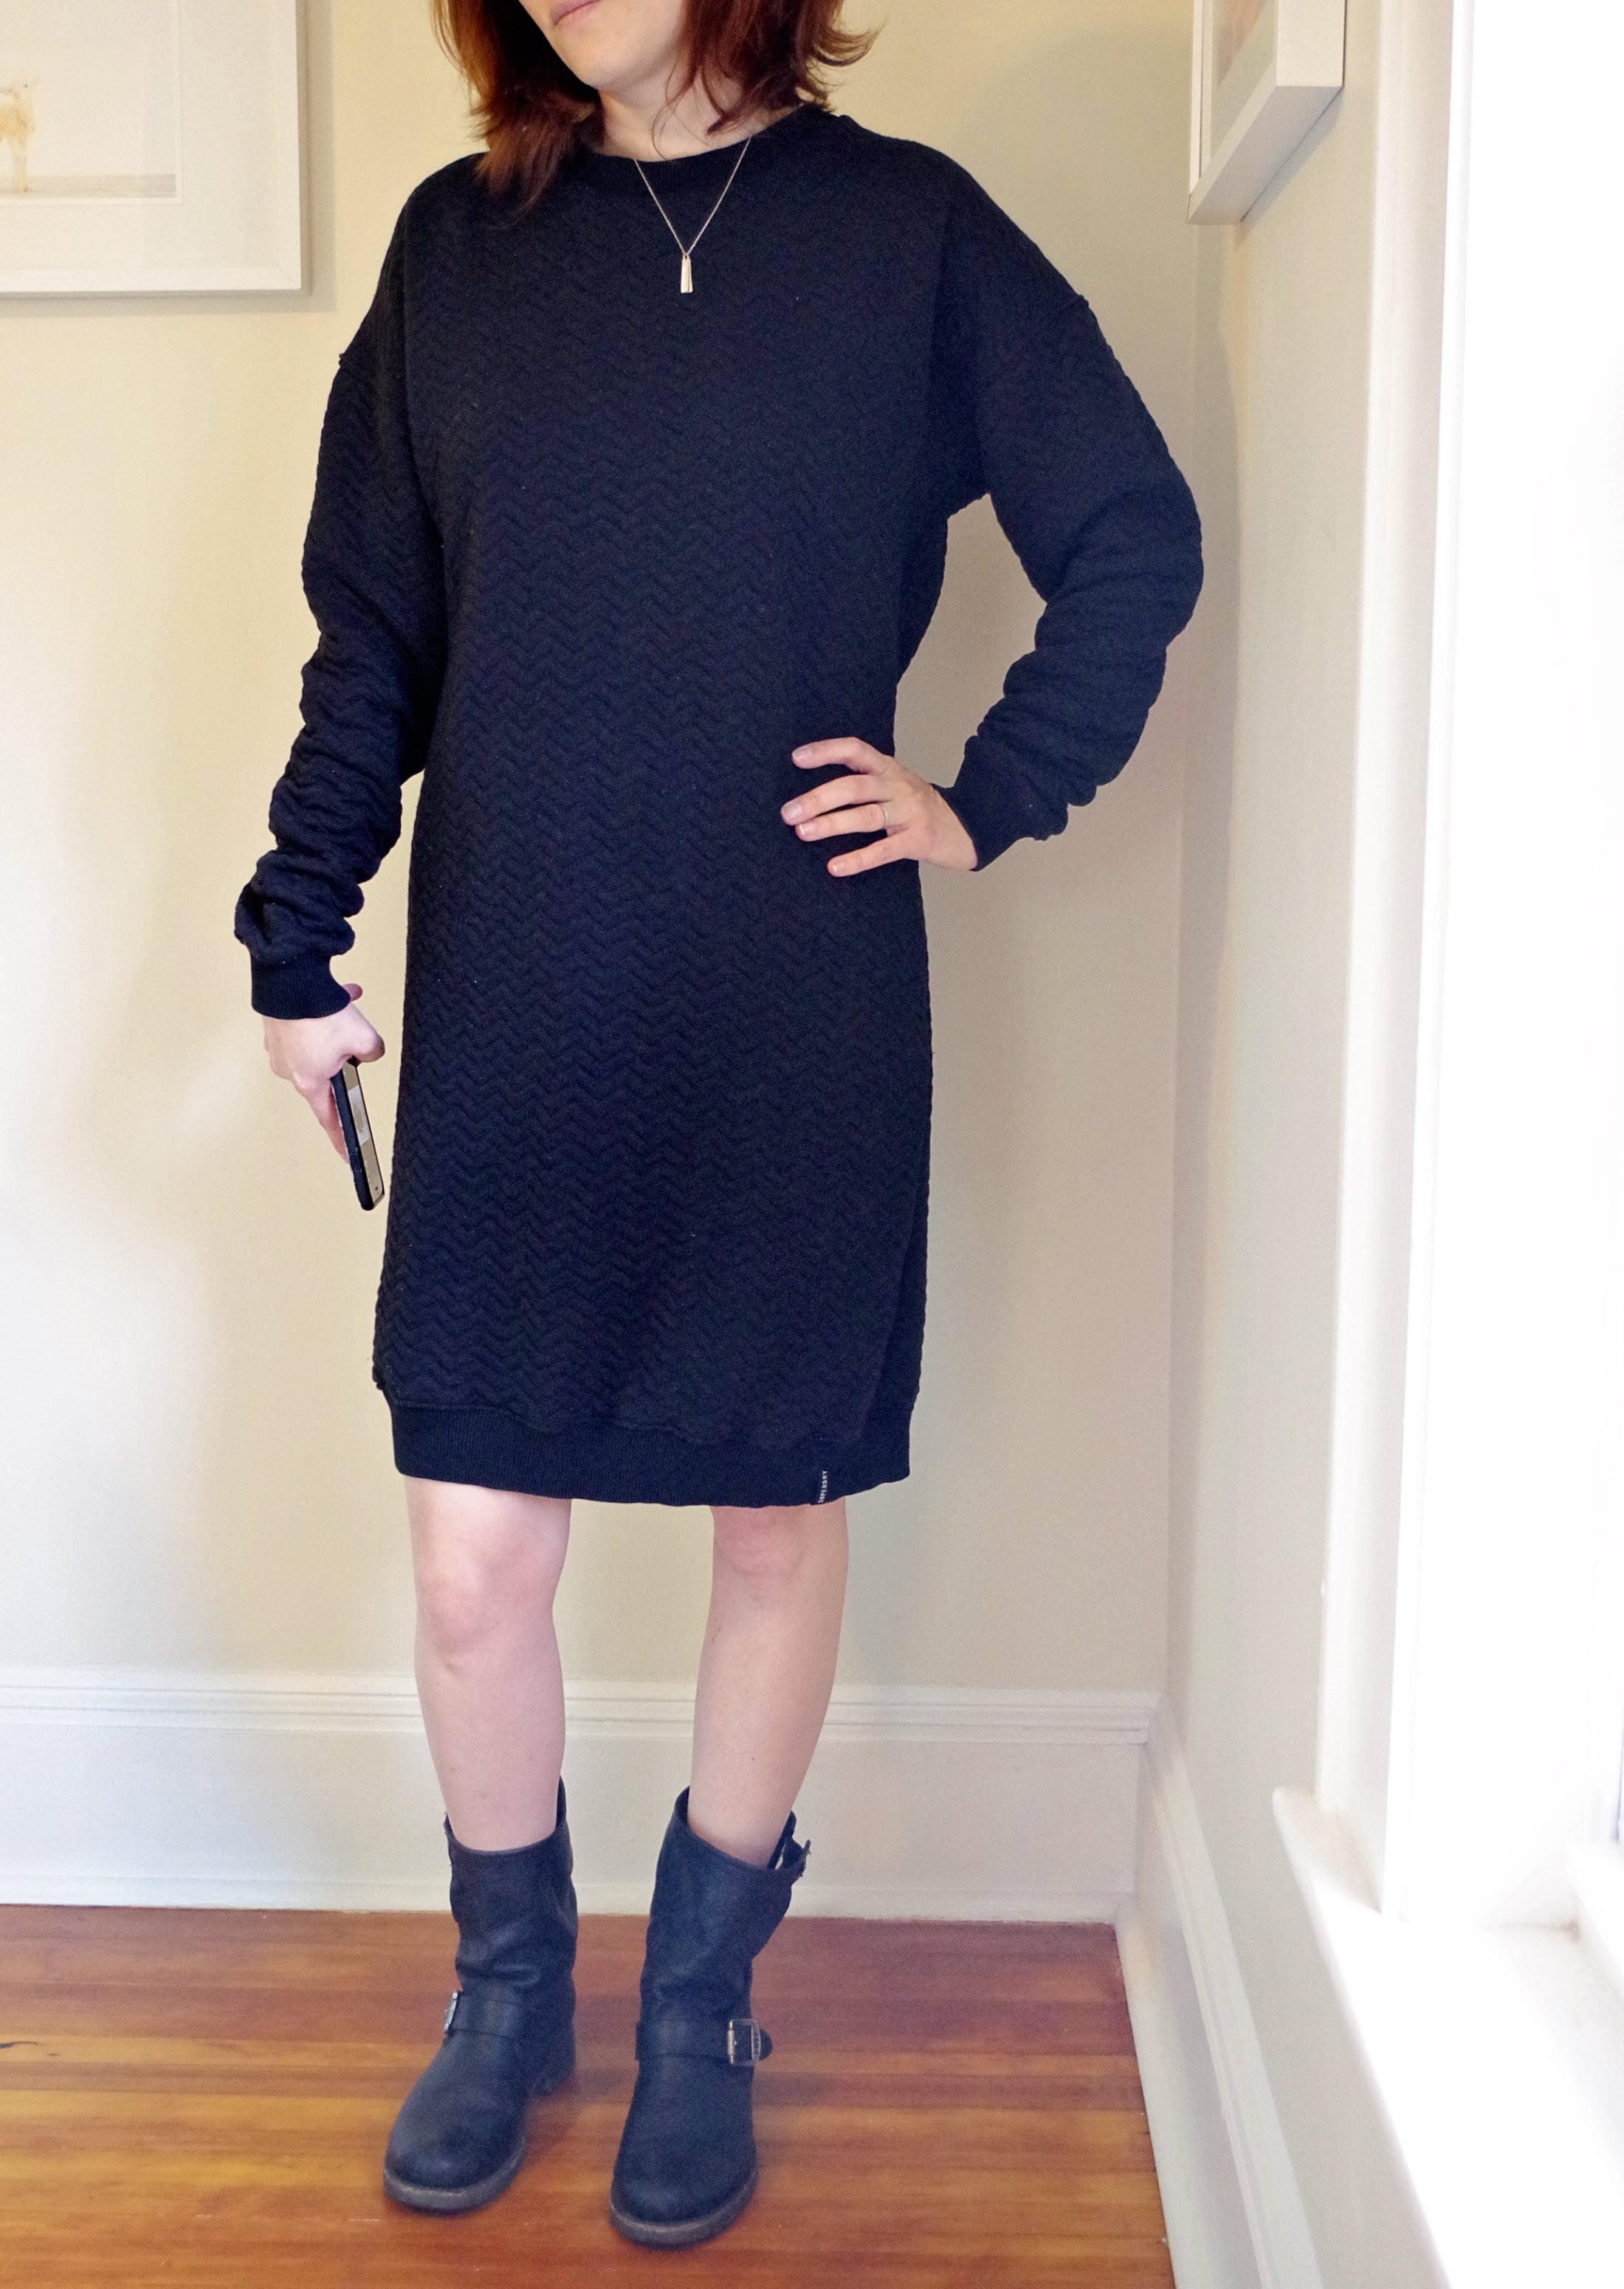 frye-moto-boots-dress